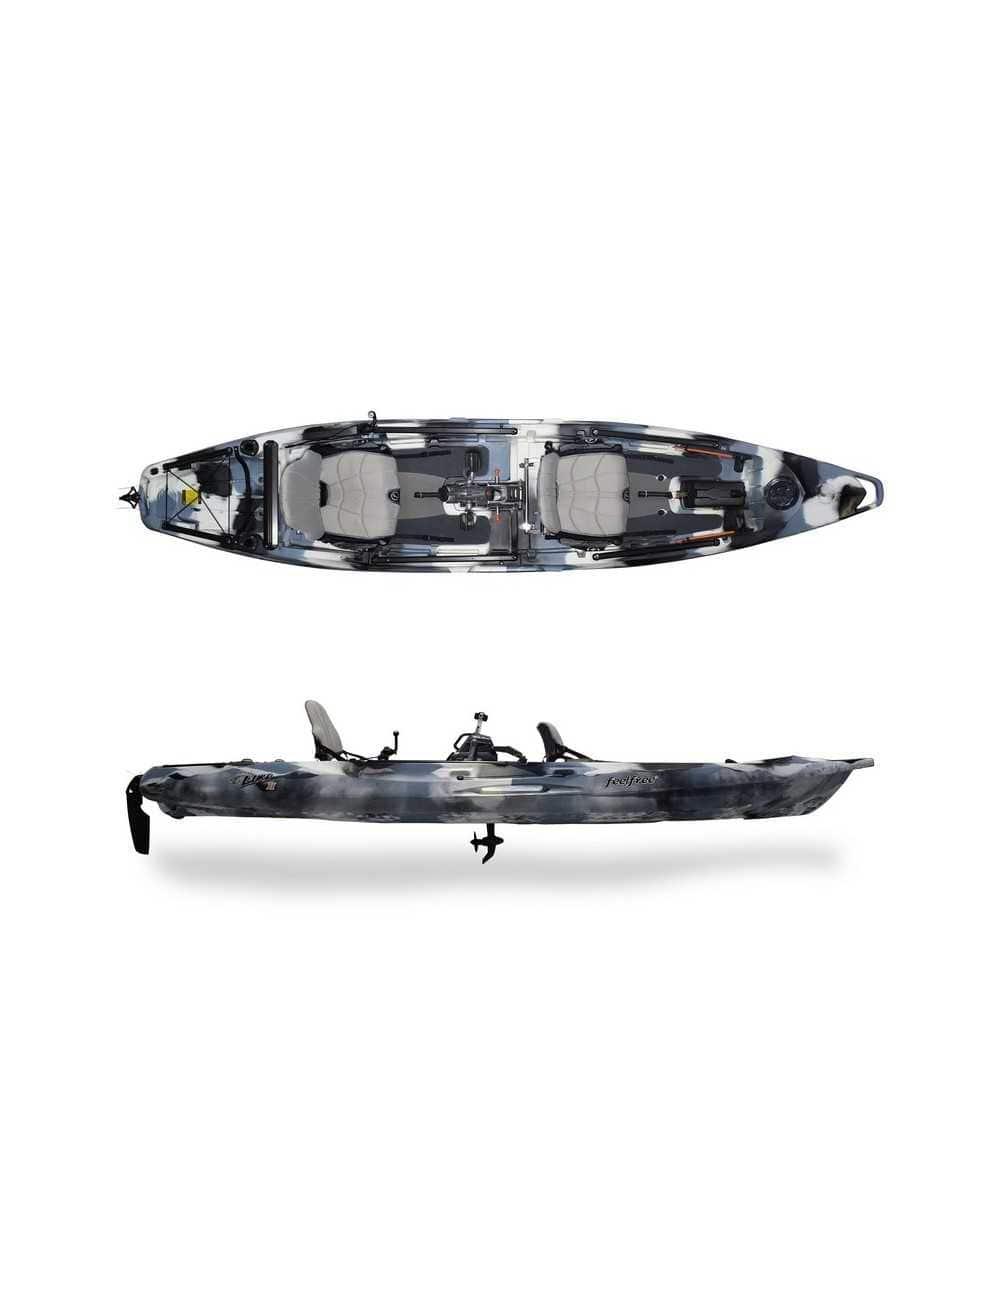 Kayak Lure 2 tandem Overdrive de Feelfree Winter Camo